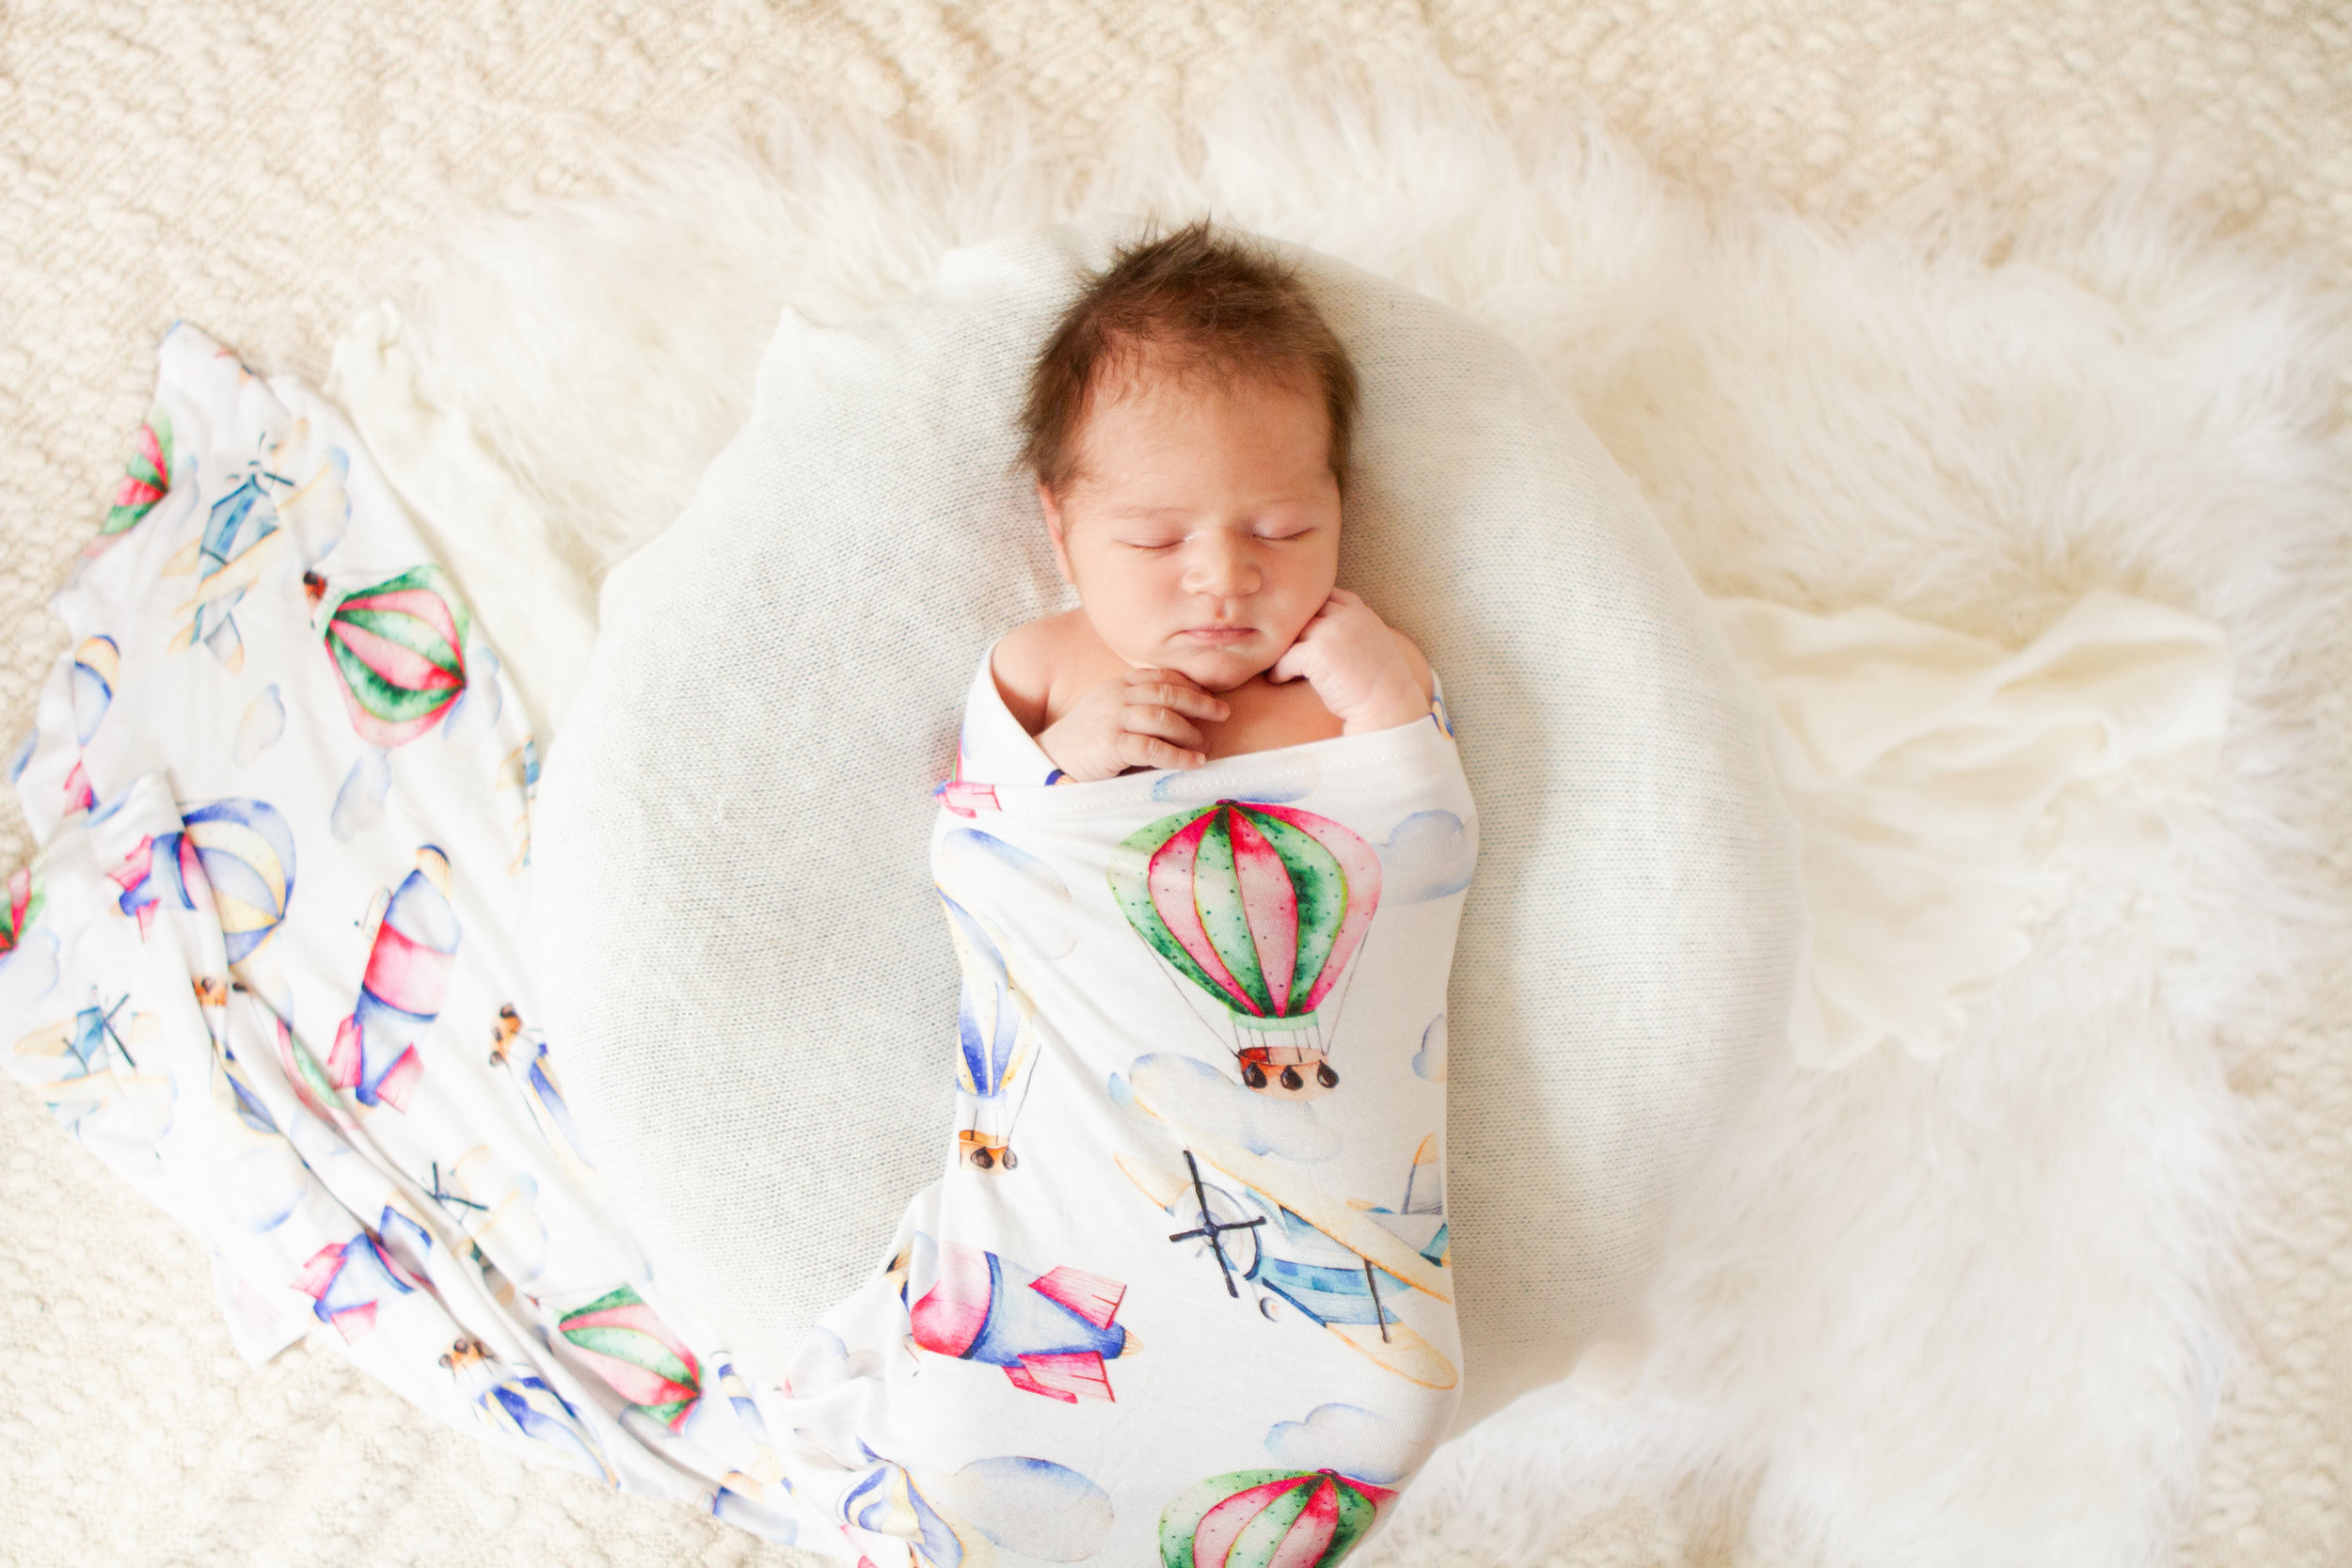 Massachusetts Newborn Photographer, Connecticut Newborn Photographer, Duxbury Newborn Photographer, Scituate Newborn Photographer, Newington Newborn Photographer, Hartford Newborn Photographer